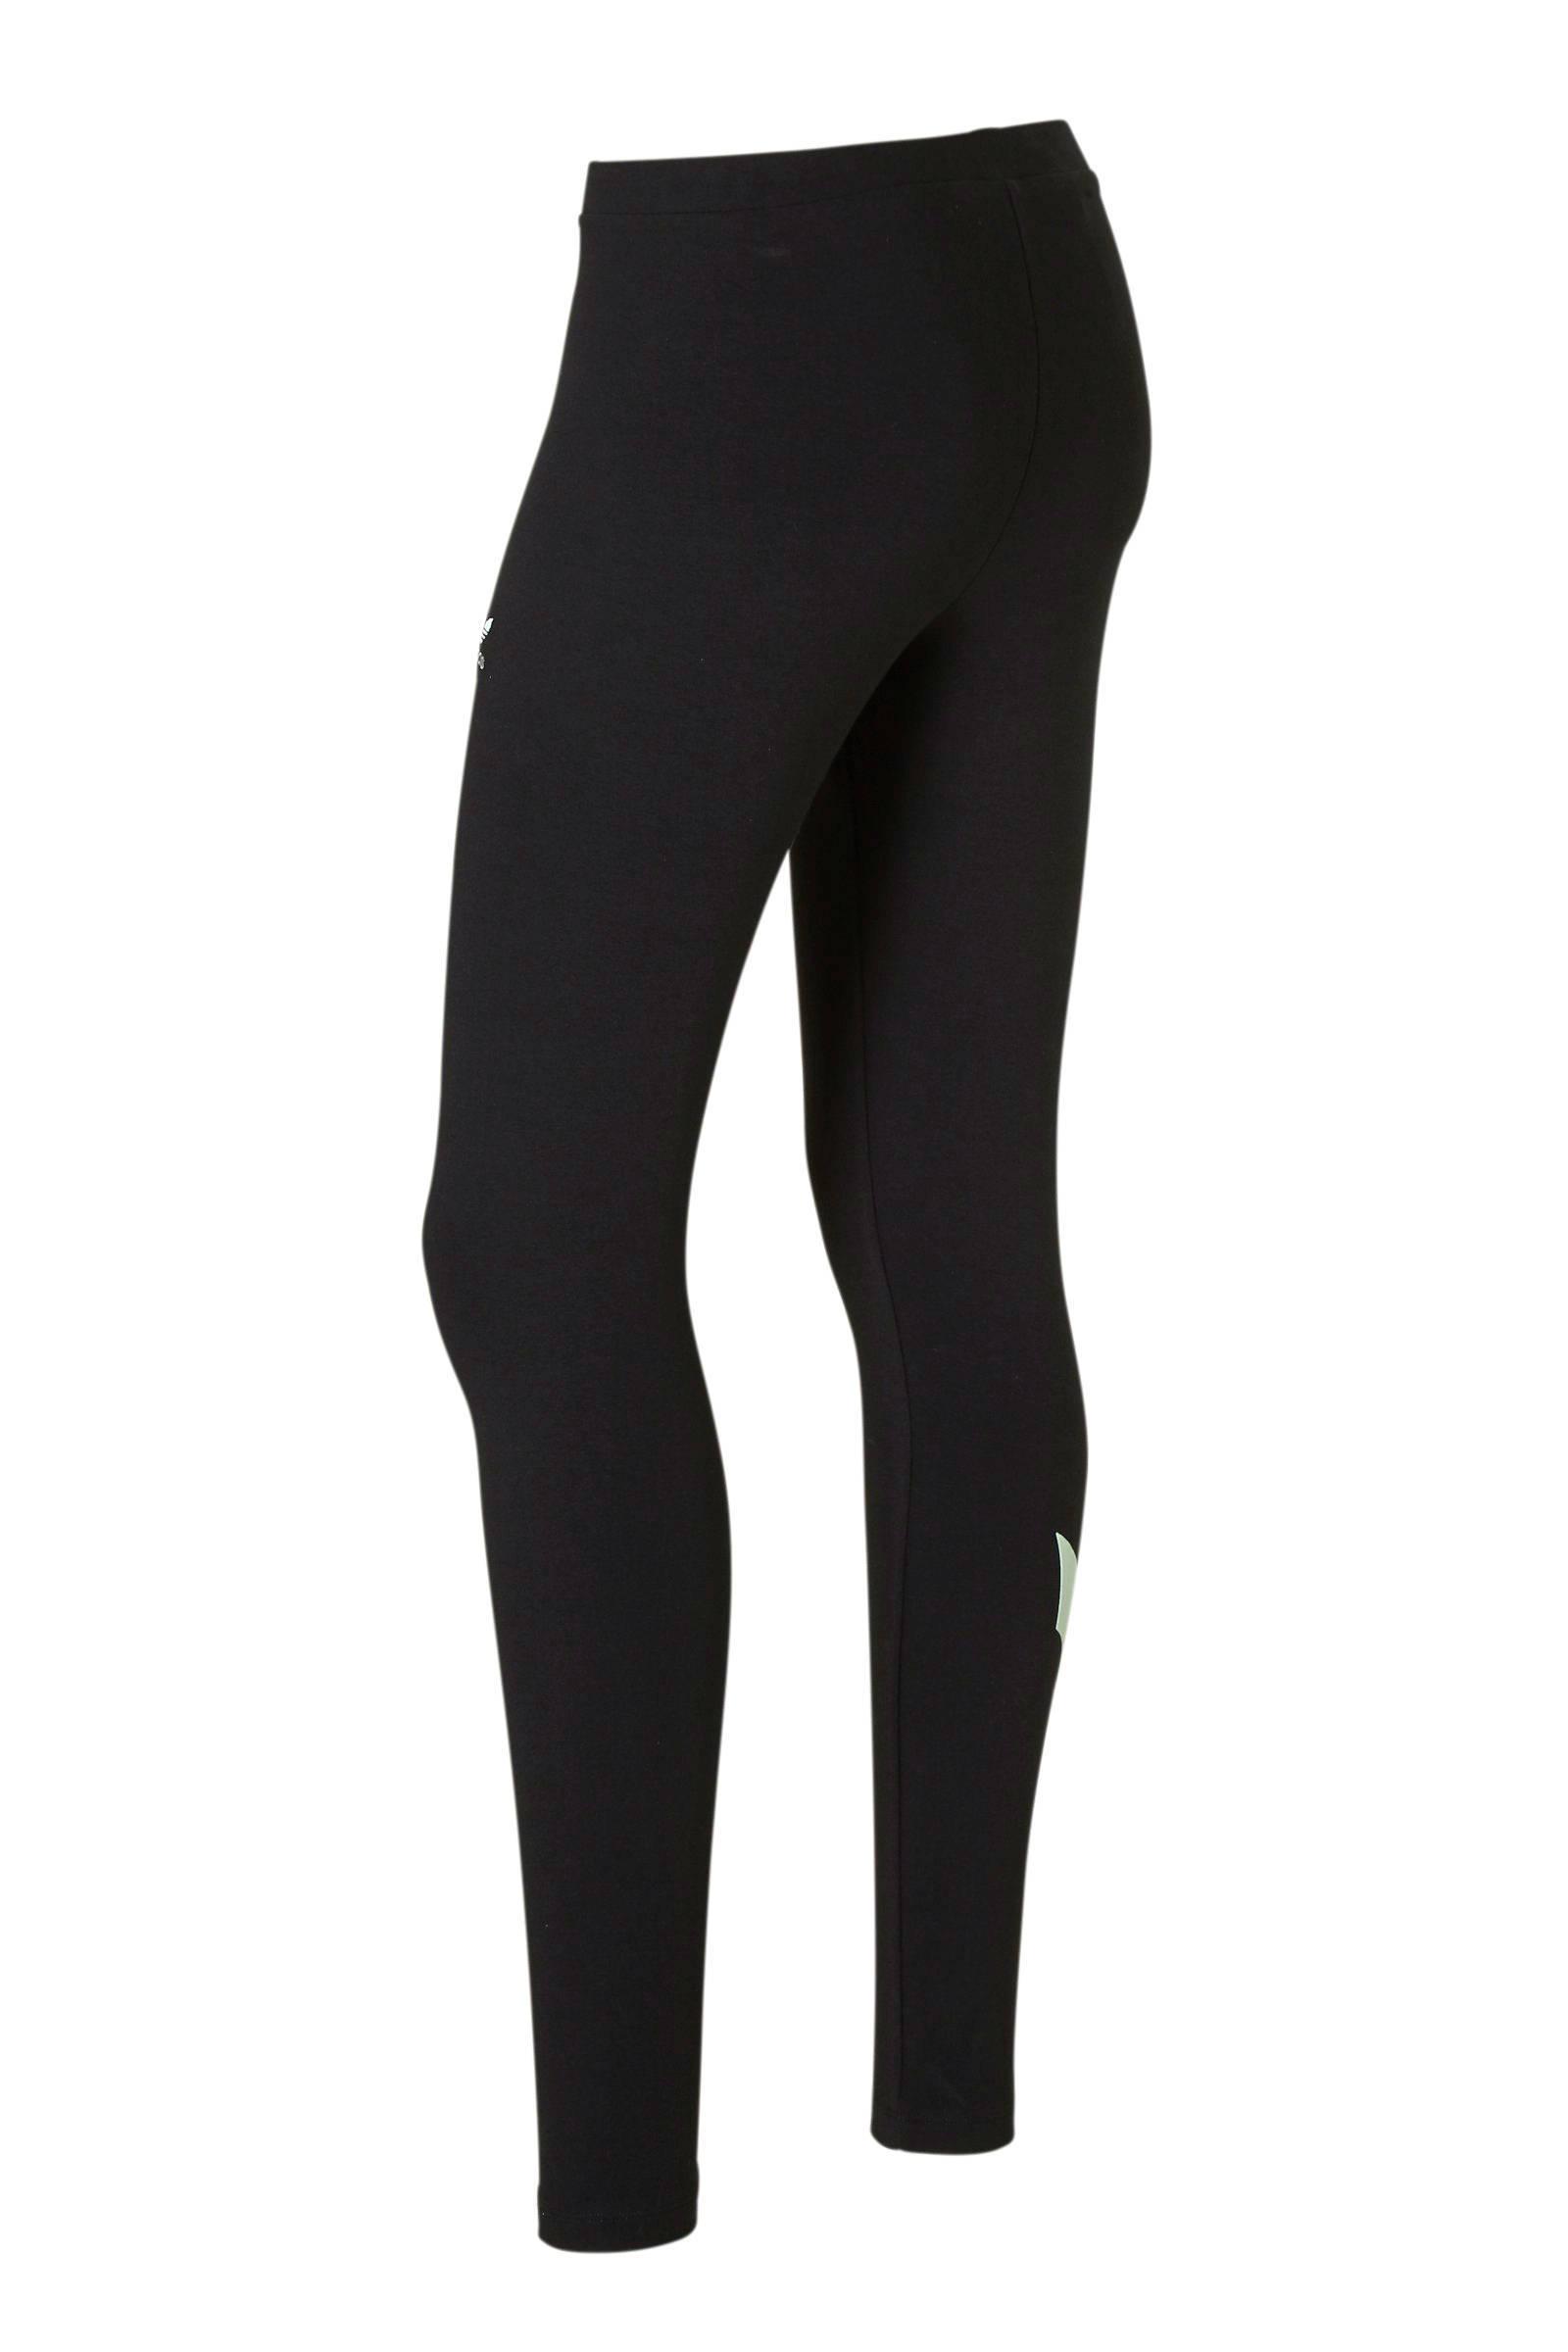 f68a8b36b02 adidas originals 7/8 legging zwart   wehkamp